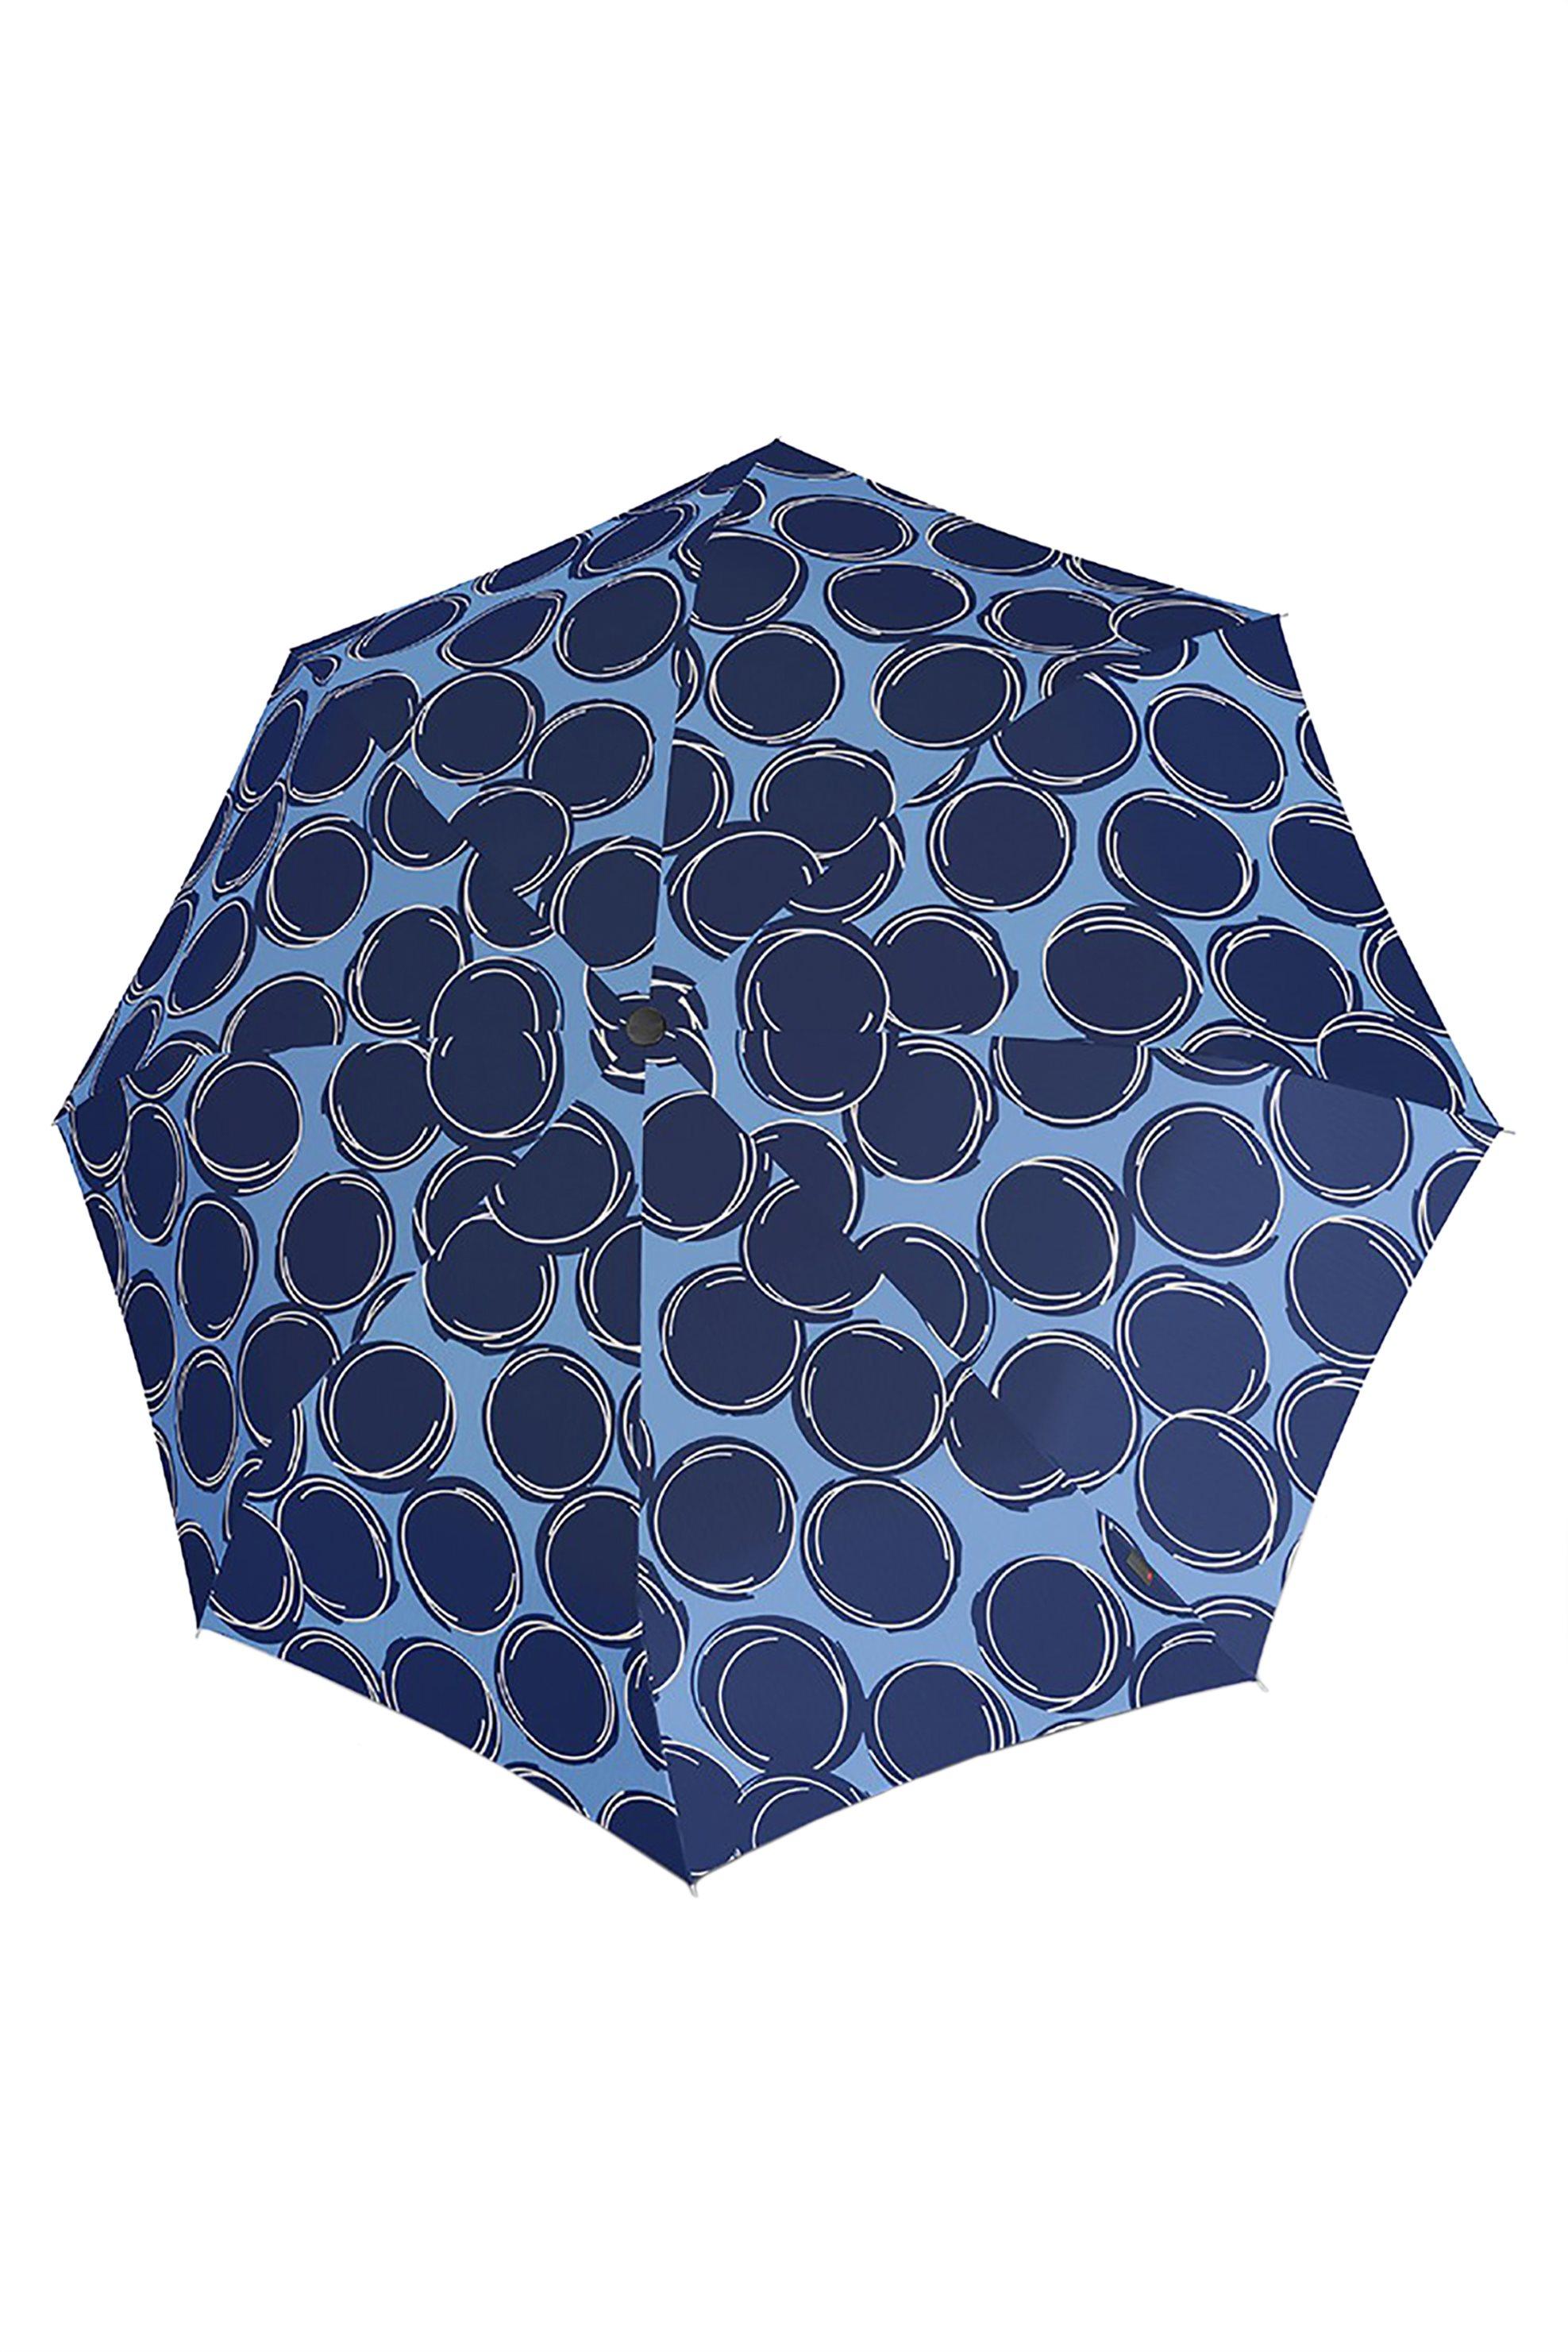 Knirps πτυσσόμενη ομπρέλα με print ''Duomatic'' - KNUM72008321